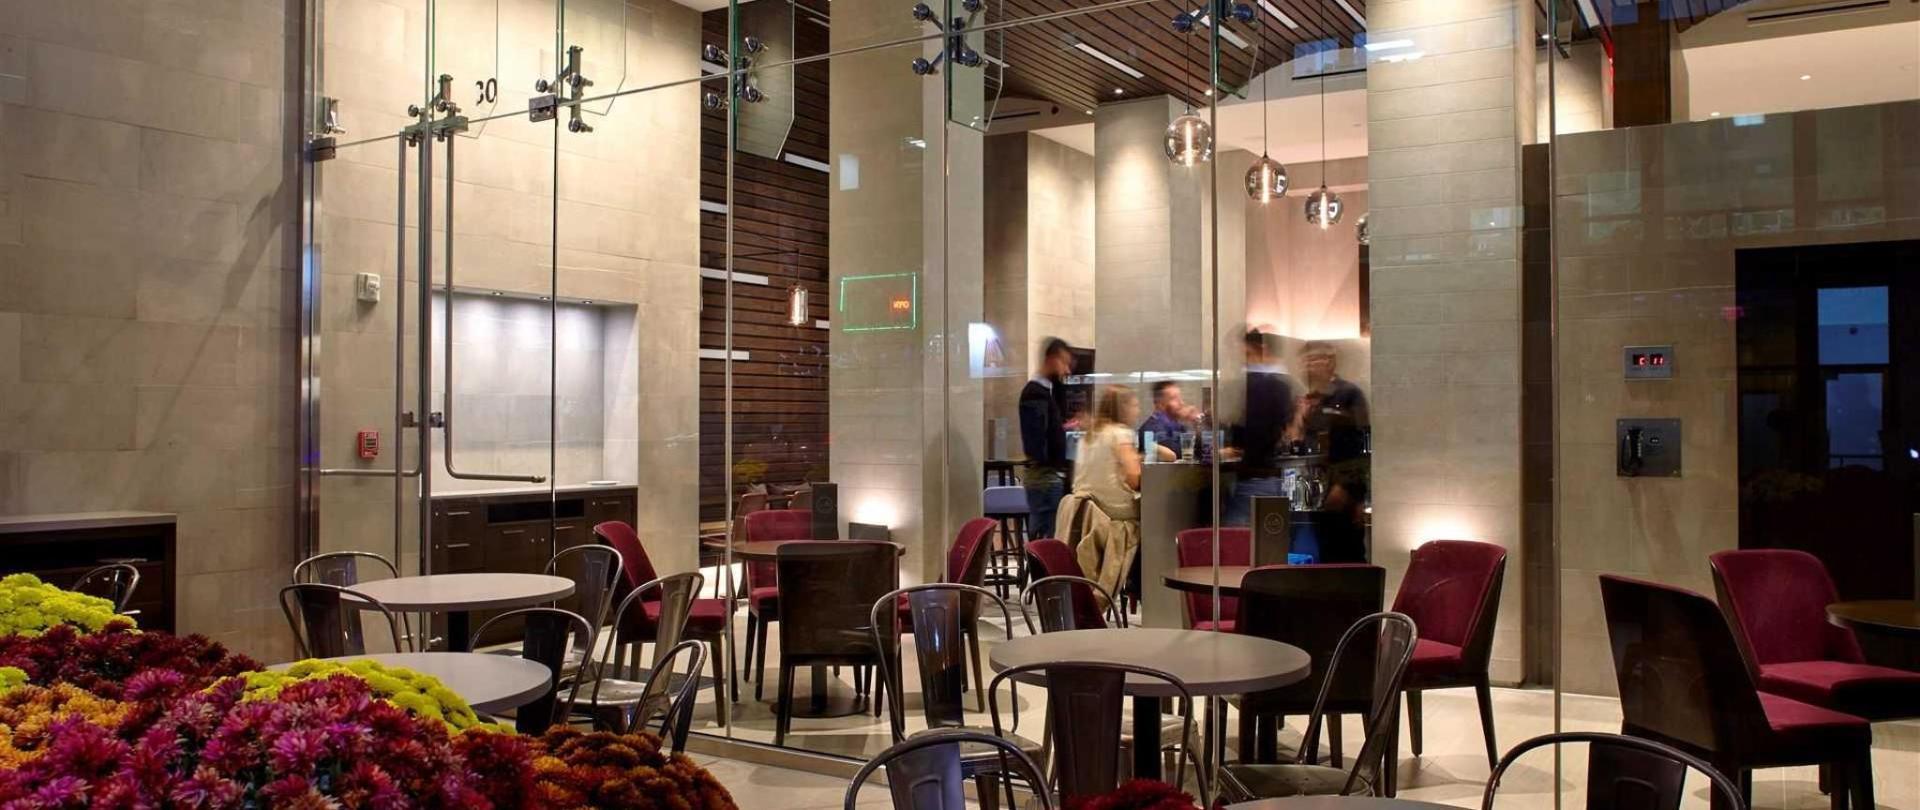 cam_ts_lounge_patio_2015.jpg.1920x0.jpg